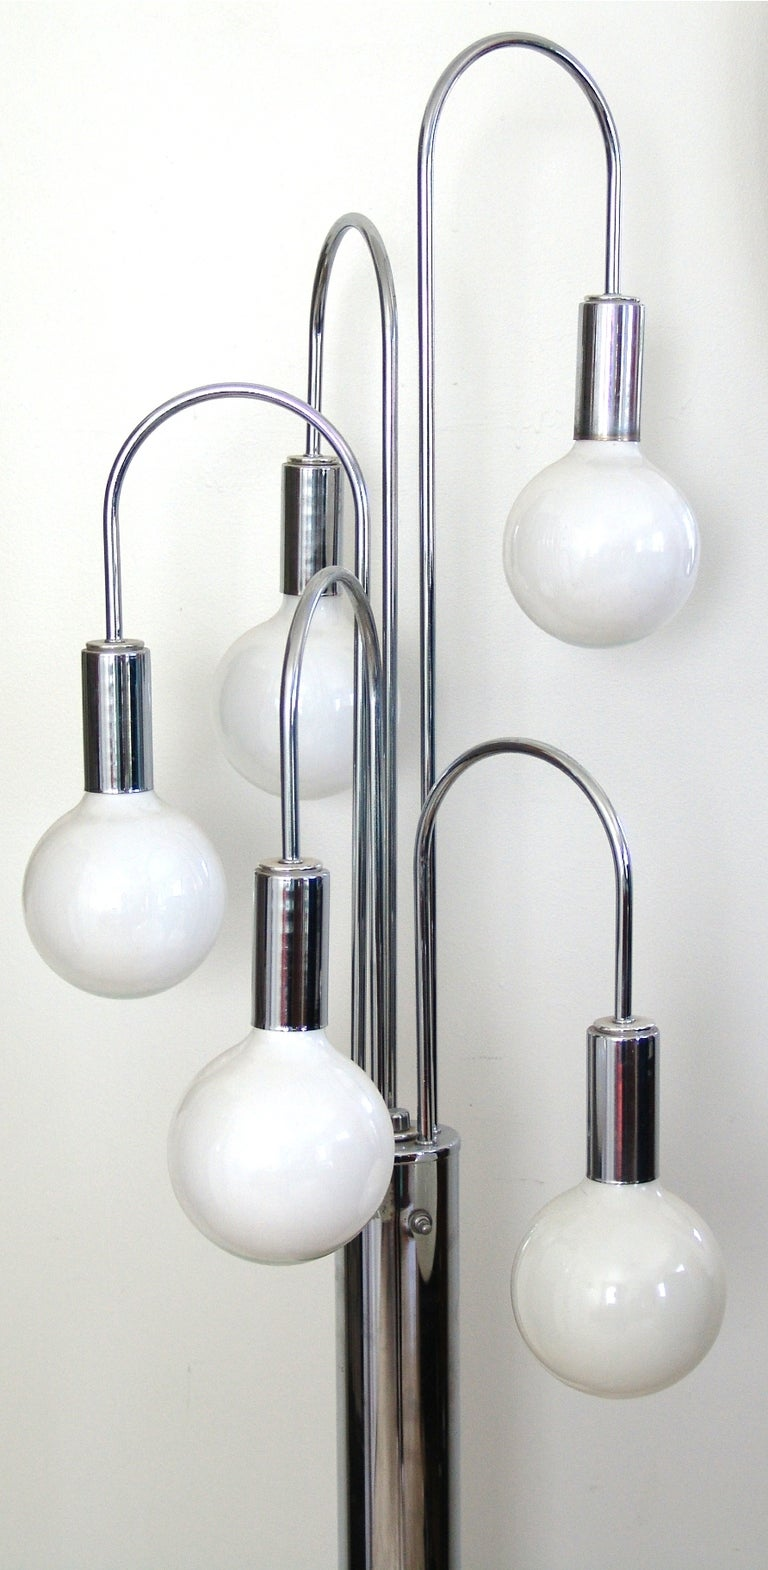 Mid Century Modern Chrome Floor Spider Lamp For Sale At 1stdibs